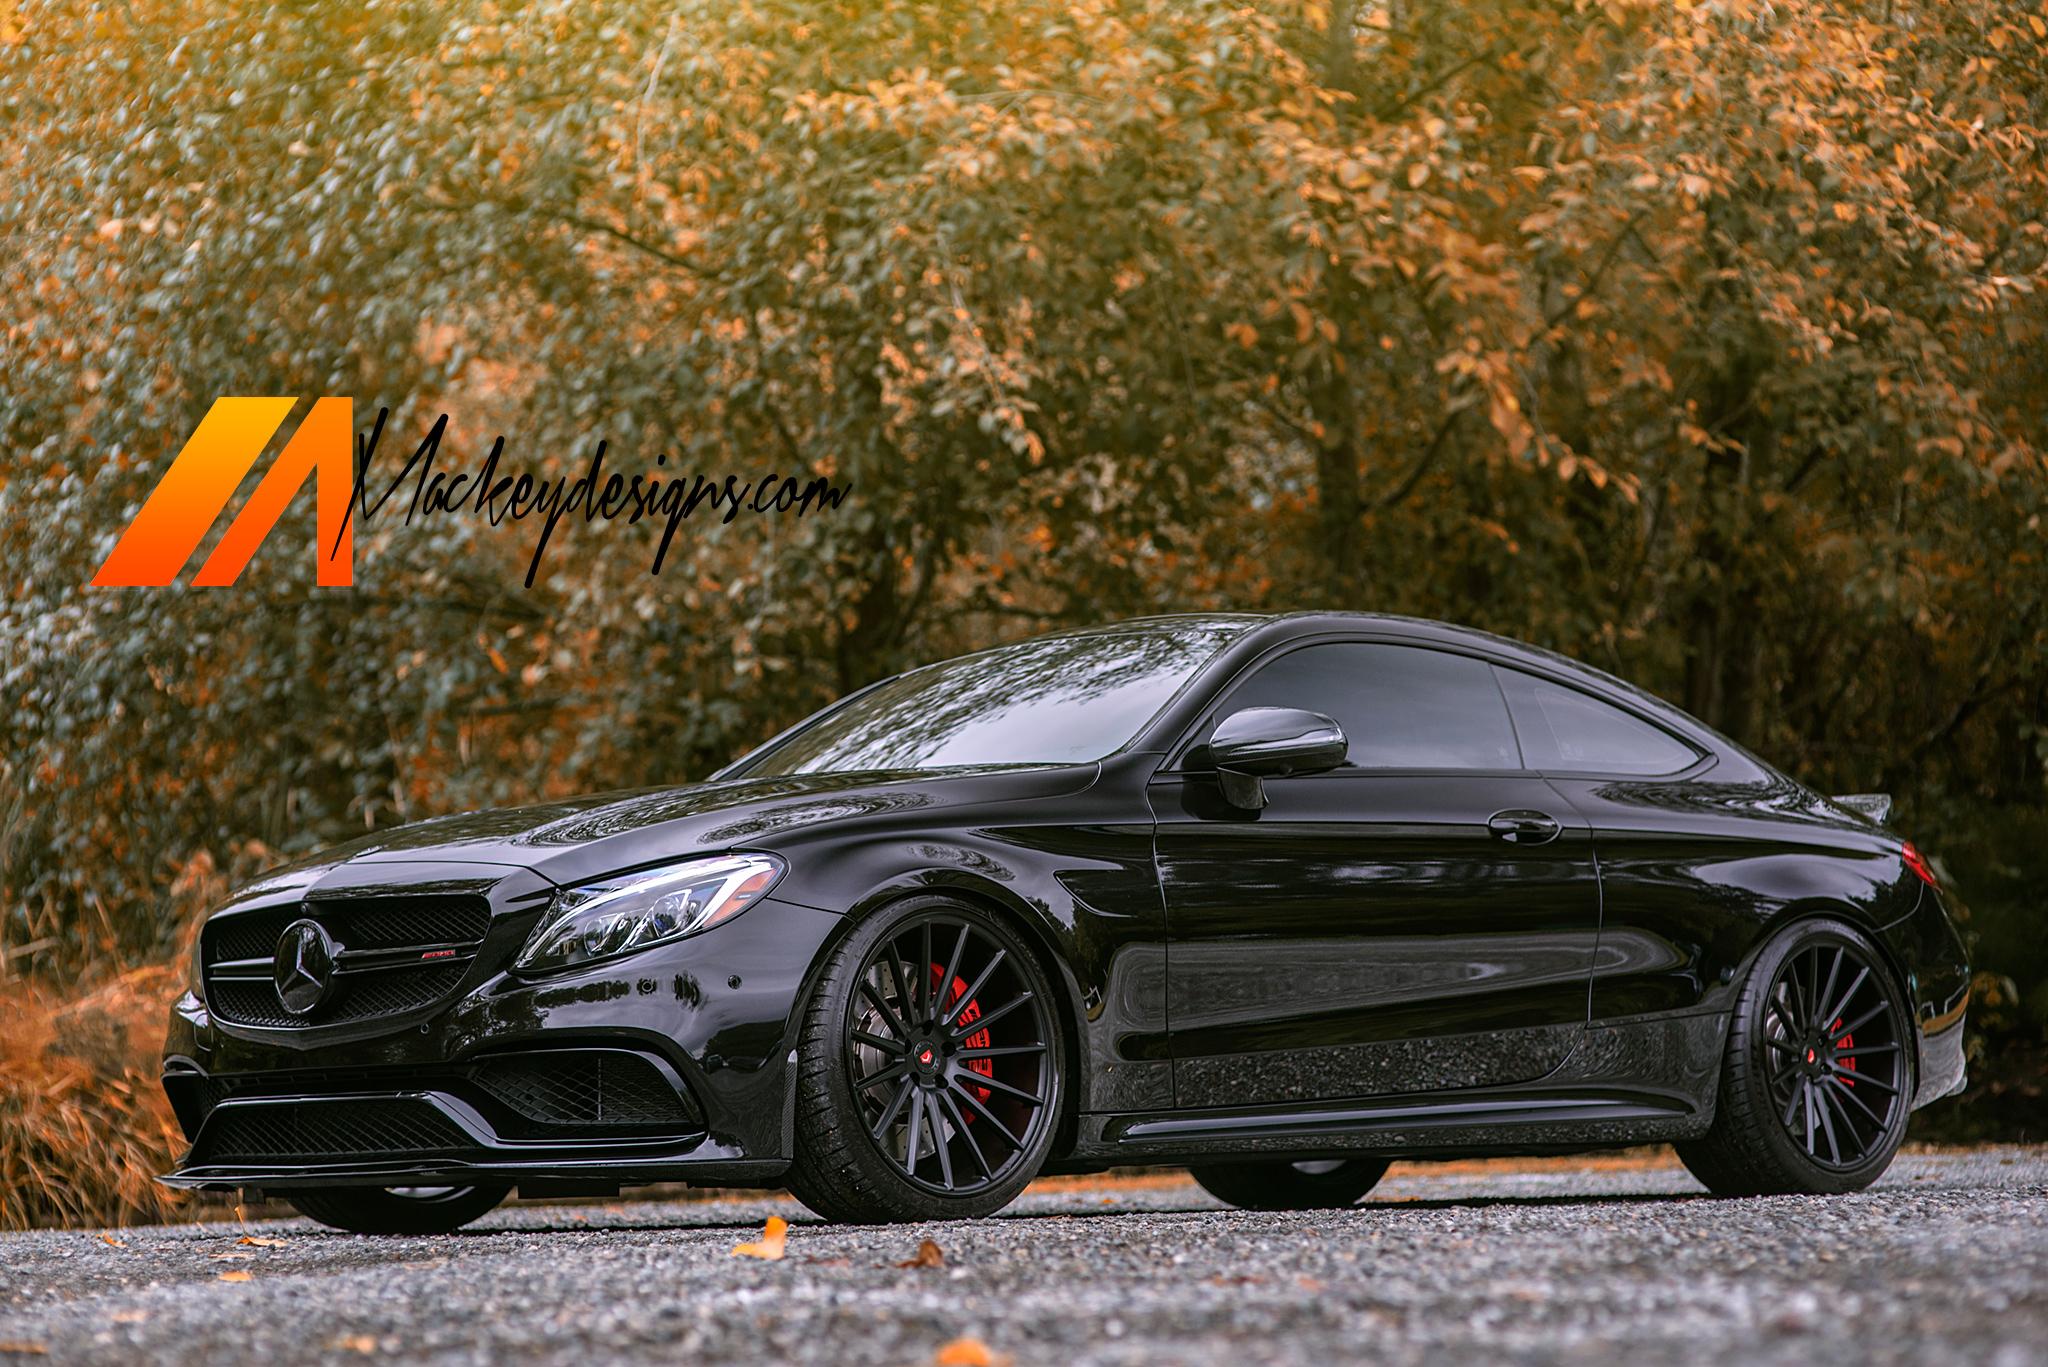 Mackeydesigns_Mercedes_C63S-11.jpg